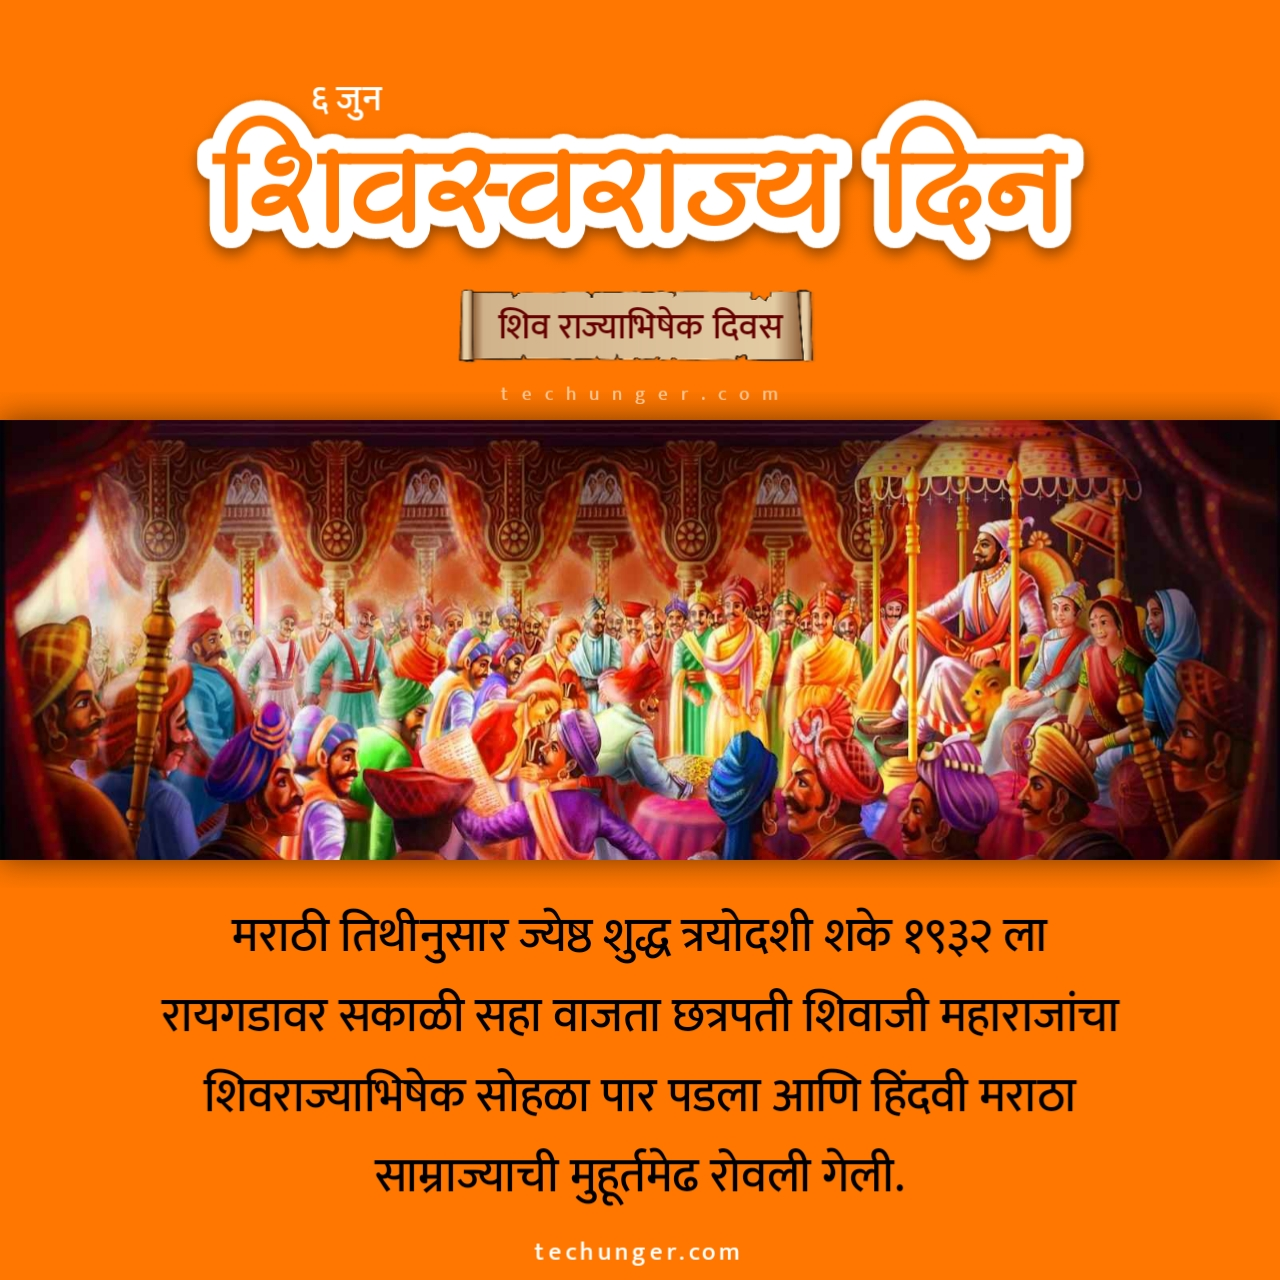 शिव राज्याभिषेक सोहळा, राज्याभिषेक सोहळा पोस्टर्स, शिवाजी महाराज राज्याभिषेक, शिव स्वराज्य दिन, शिव स्वराज्य दिवस, छत्रपती, chhatrapati, shivaji maharaj, chhatrapati shivaji maharaj, 6 जून शिव दिनविशेष, फ्री पोस्टर्स, फ्री सोशल मीडिया पोस्ट, फ्री दिनविशेष, फ्री शिवाजी महाराज पोस्ट डाऊनलोड, rajyabhishek post Download, shiv rajyabhishek banner free, 2021-06-06, 06/06/2021, 6 Jun, 6 Jun 2021, 6 Jun dinvishesh, 6 Jun techunger, ०६/०६/२०२१, ०६ जून दिनविशेष, ०६ जून घटना, ६ जून जन्मदिन, ६ जून स्मृतिदिन, ६ जून इतिहास, techunger, Saurabh Chaudhari, marathi quotes, hindi quotes, motivational quotes, quotes, free status, status, whatsapp status, instagram posts, famous quotes, famous person quotes, techunger blogs, famous jayanti, shiv dinvishesh, daily banner, daily posts, daily status, on this day, famous birthdays today, did you know, तुम्हाला माहित आहे का